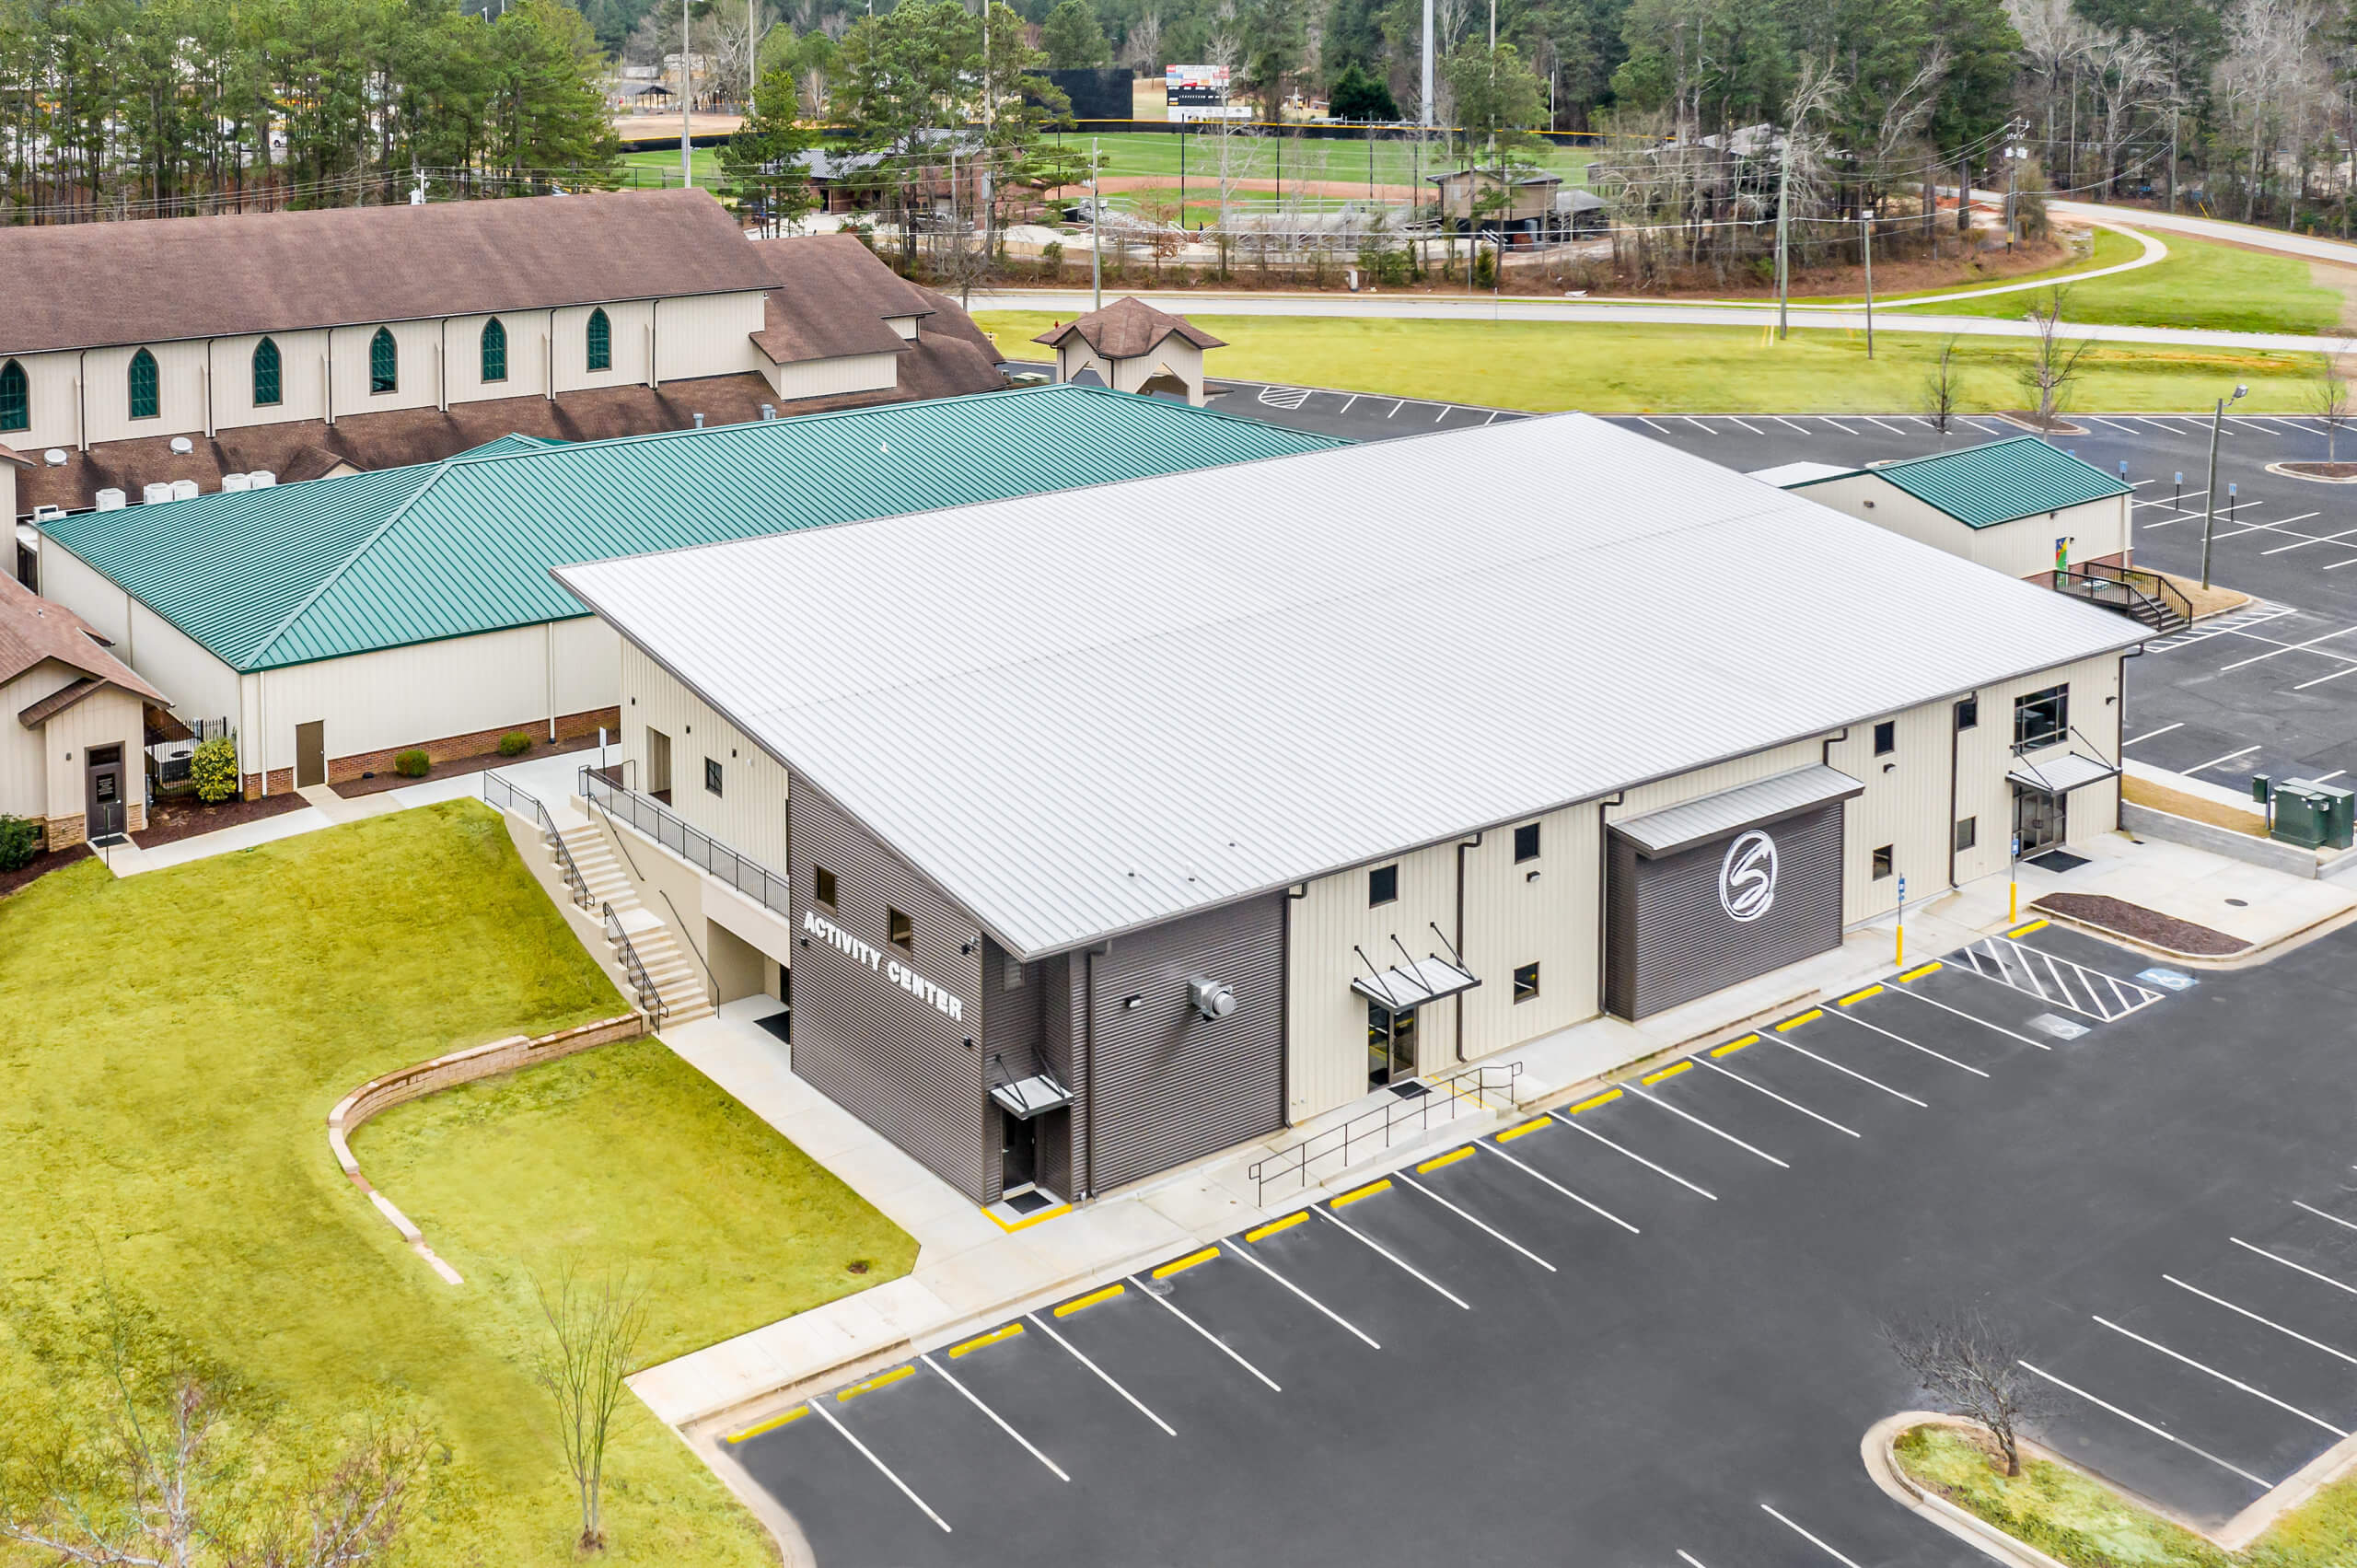 The Sanctuary Church – Children's Activity Center